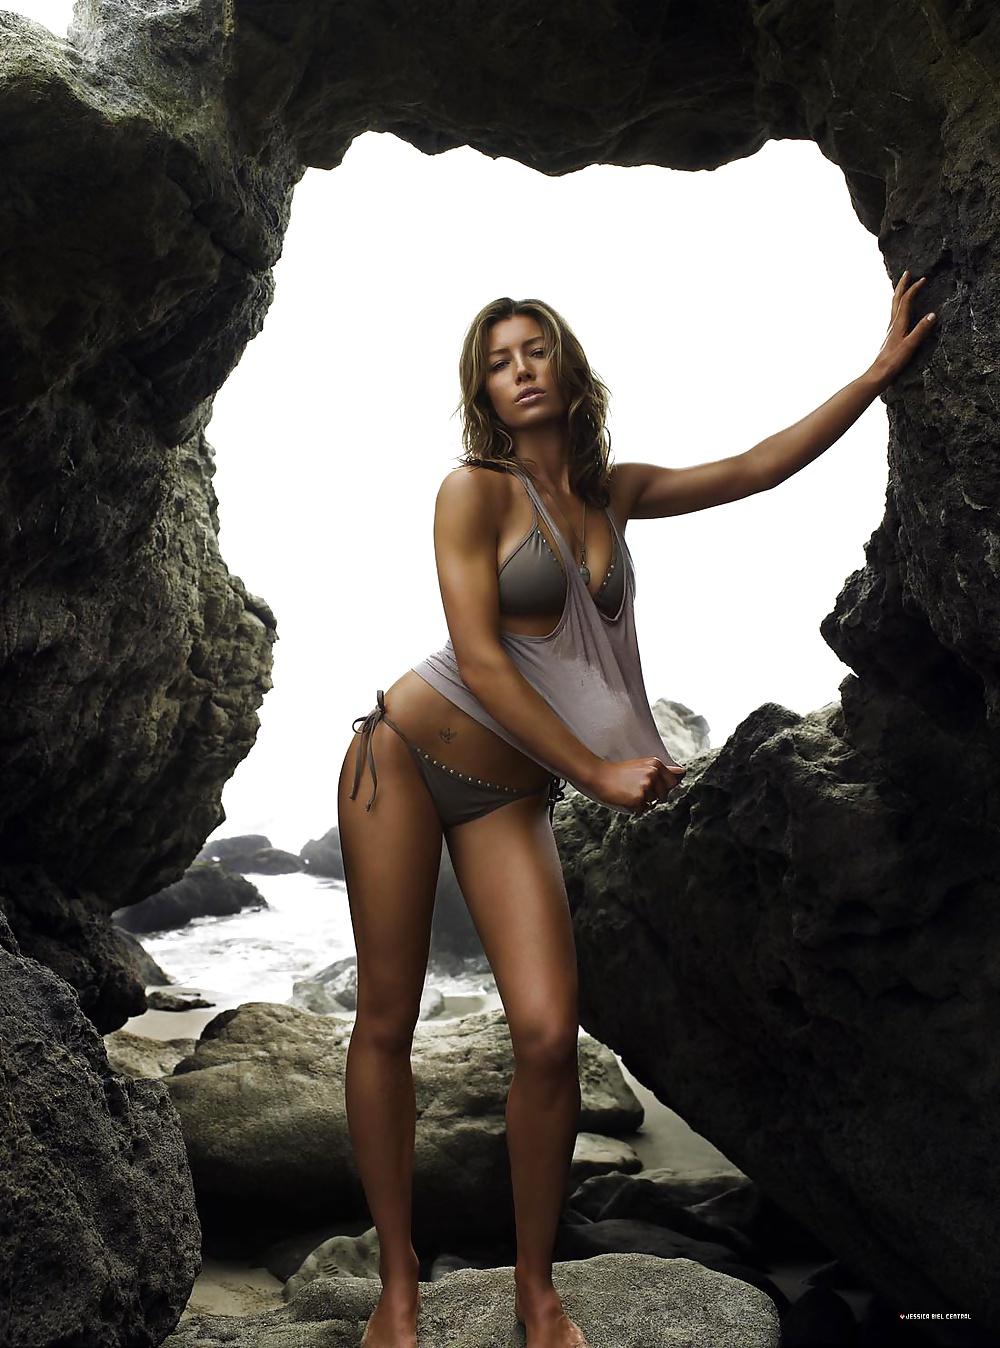 Jessica biel bikini gallery